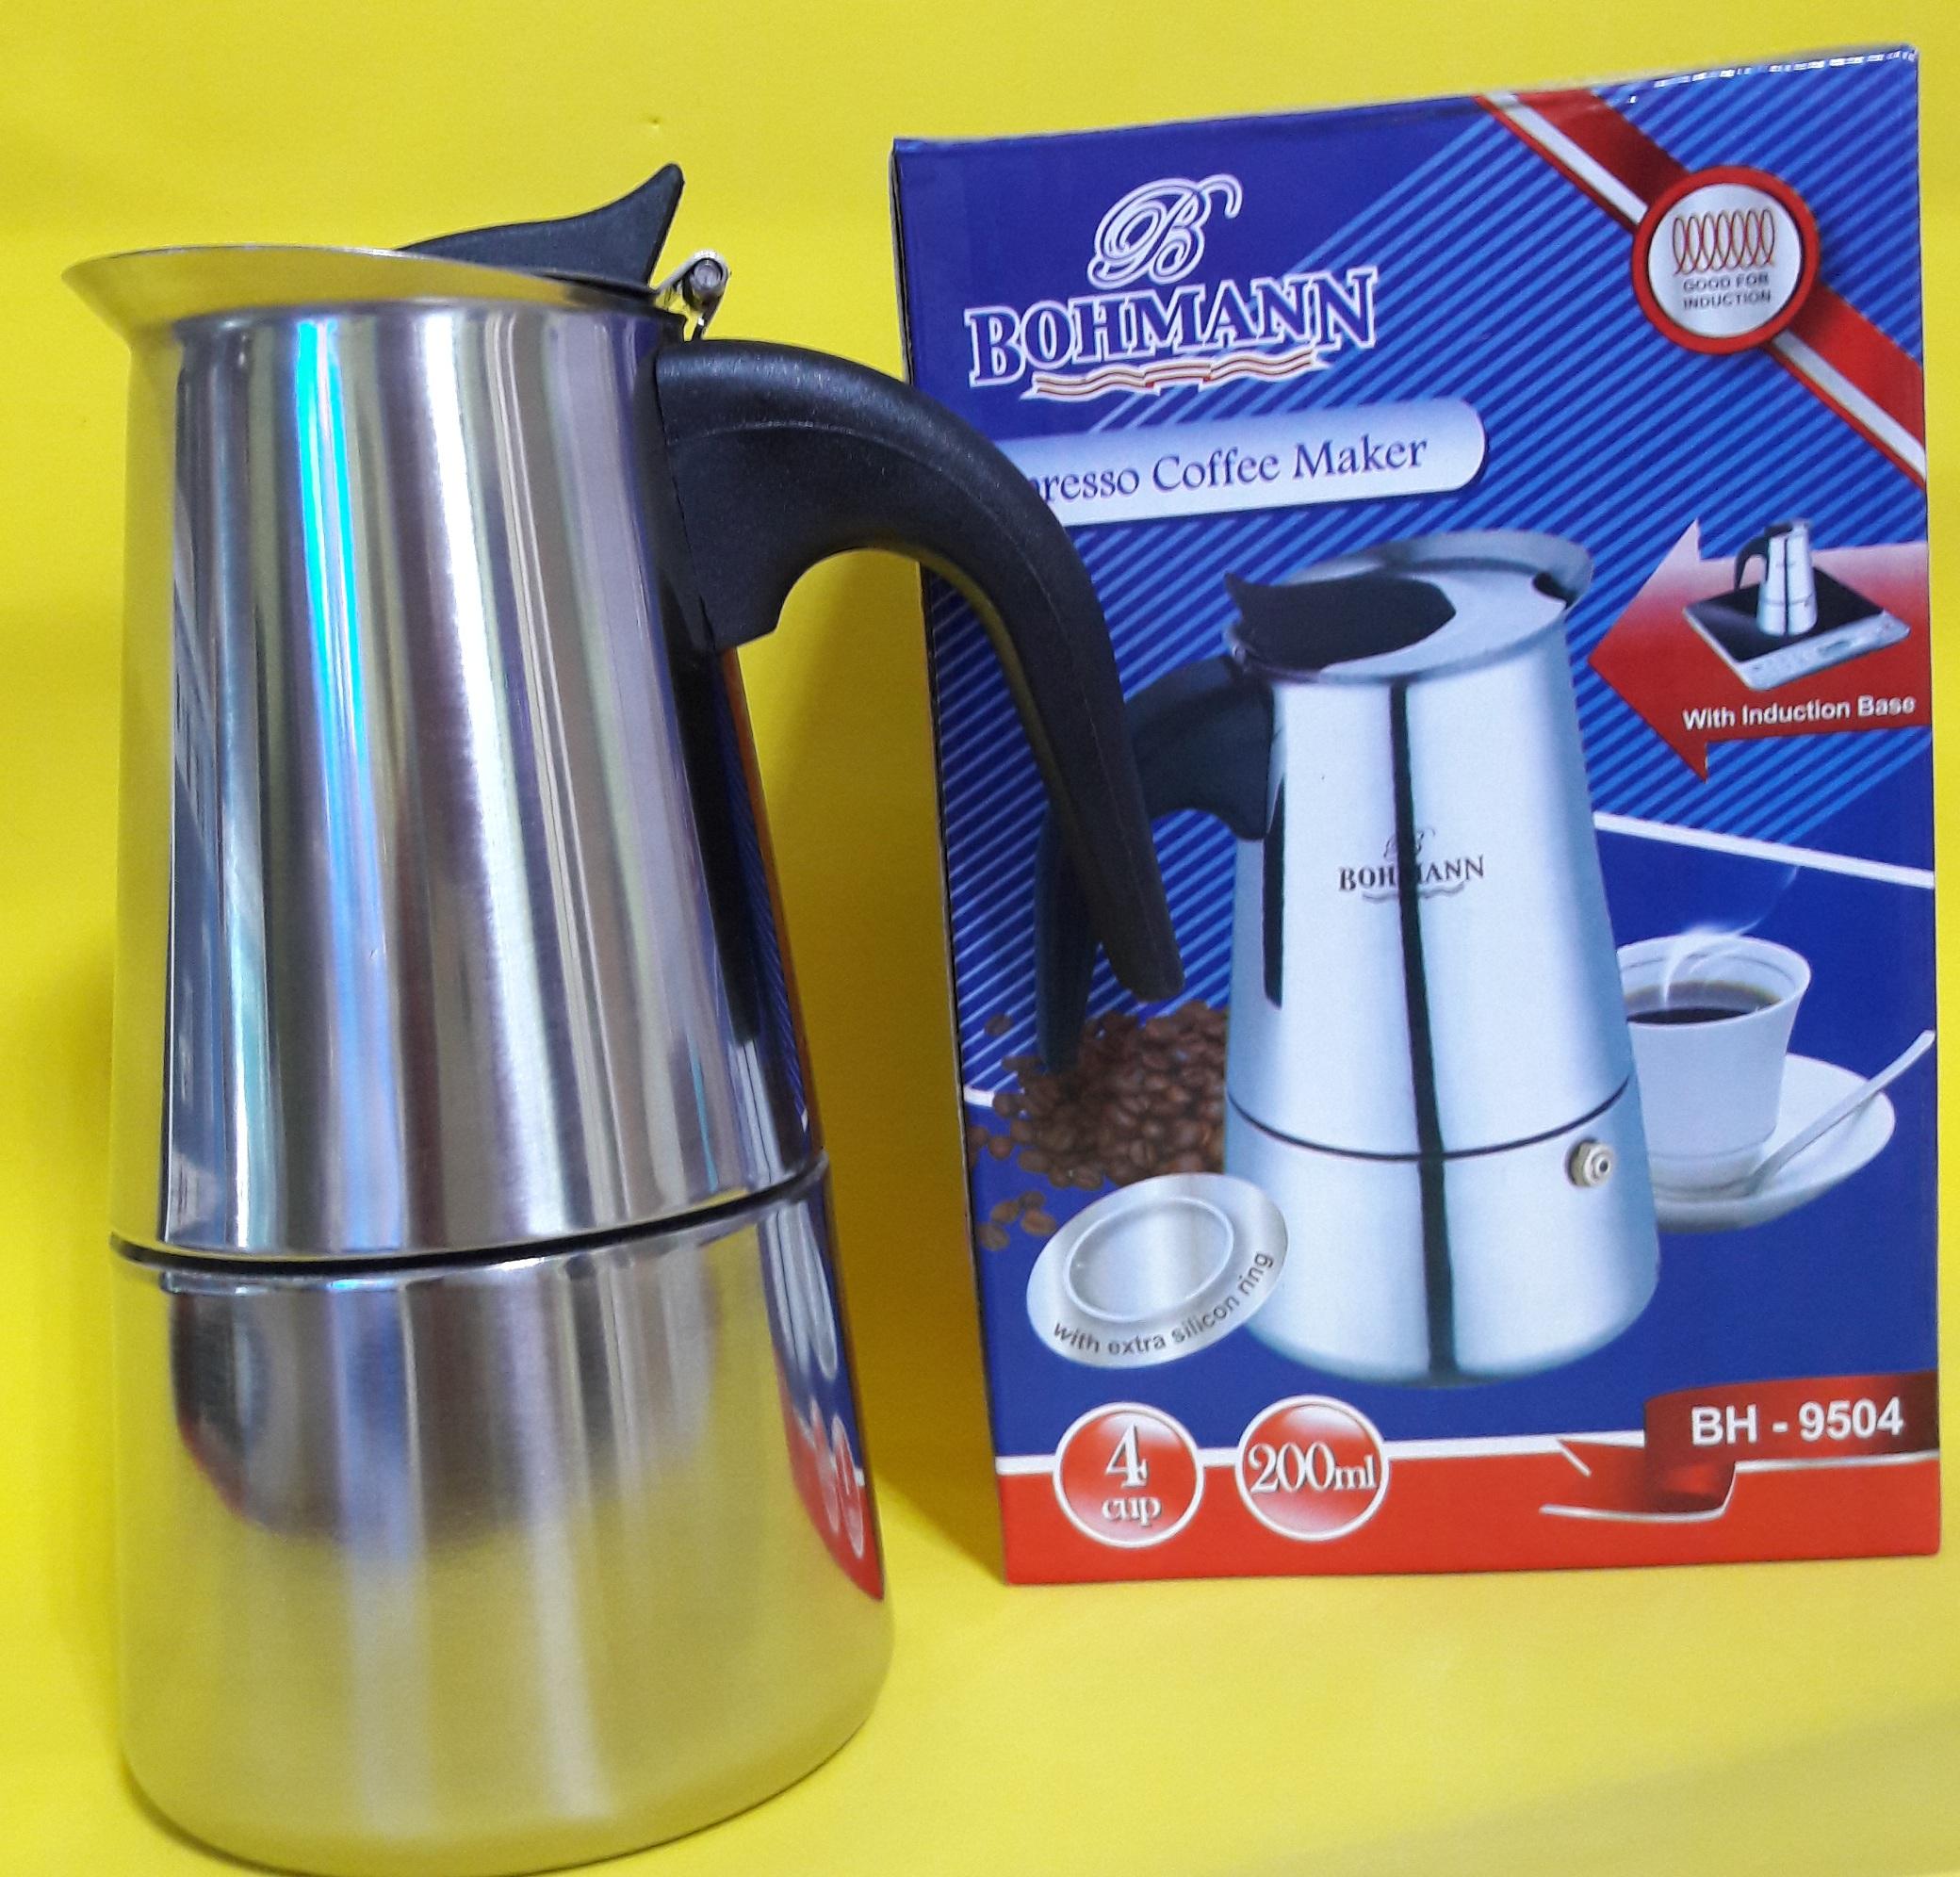 BOHMANN Кофеварка гейзерная на 4 чашки BH 9504